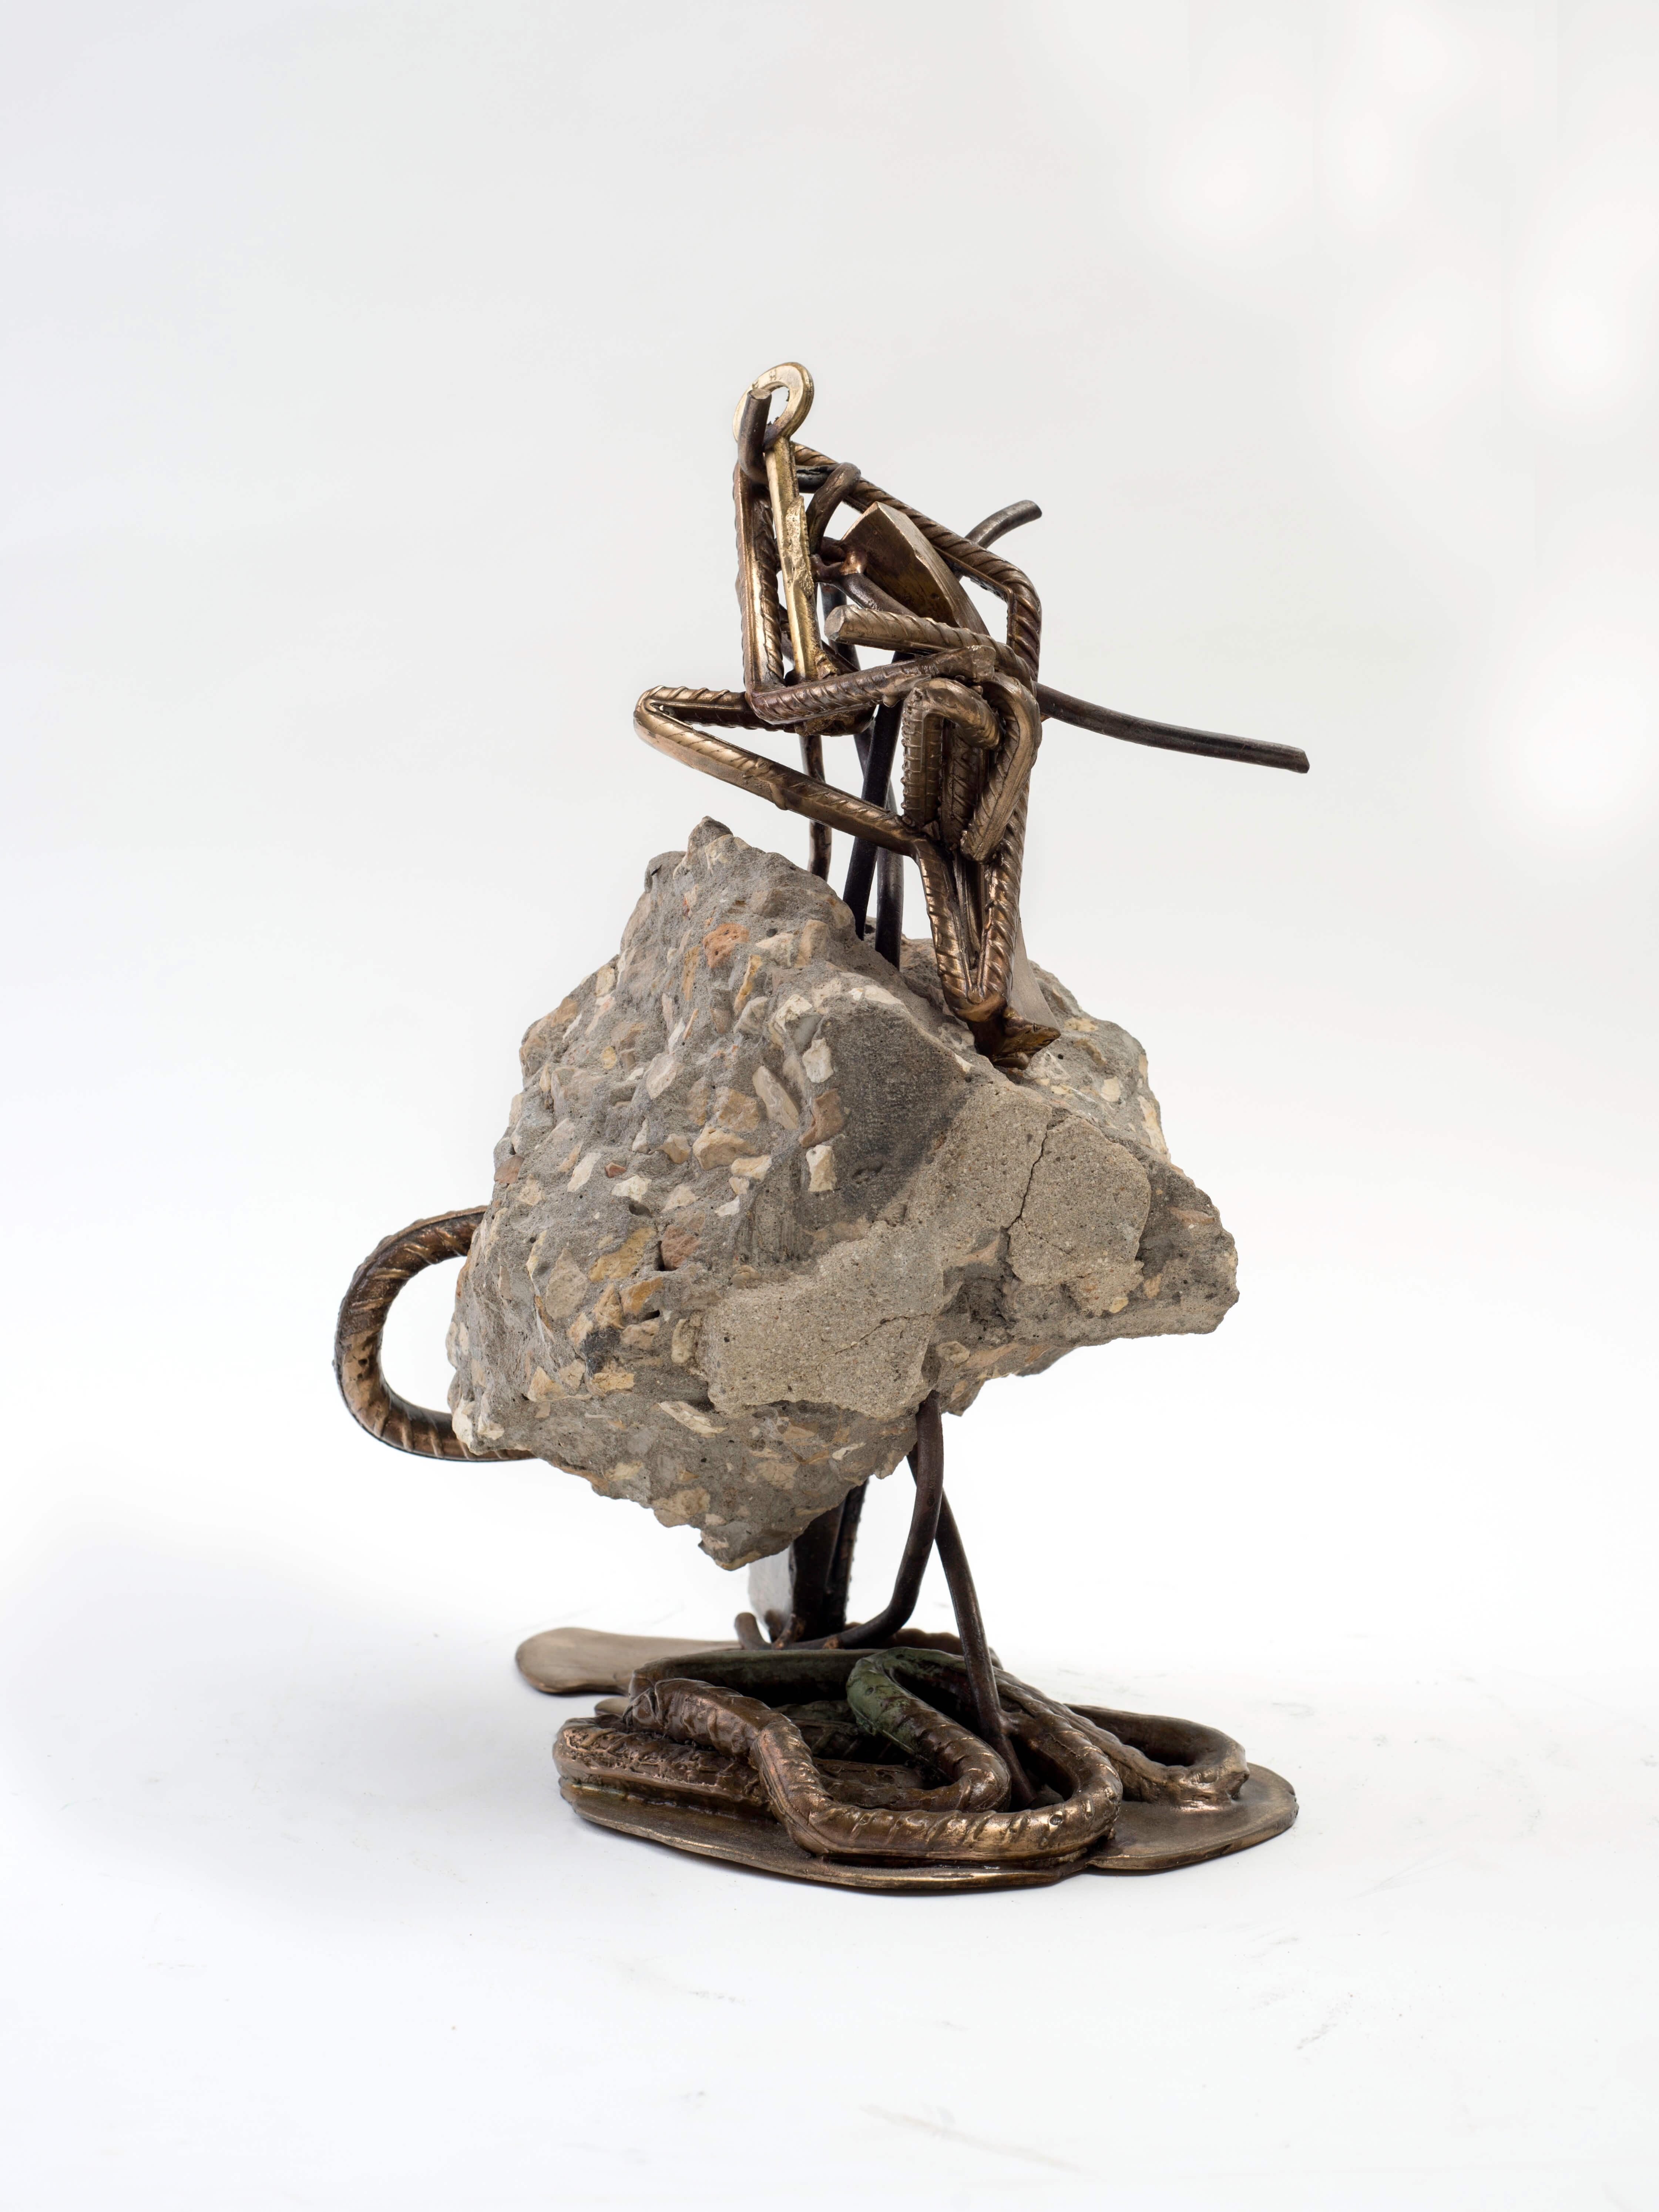 1230_Drora Dominey, Tangle, 2015, Bronze, iron, concrete and building debris, 37x25x25 cm (3)-4483x5977